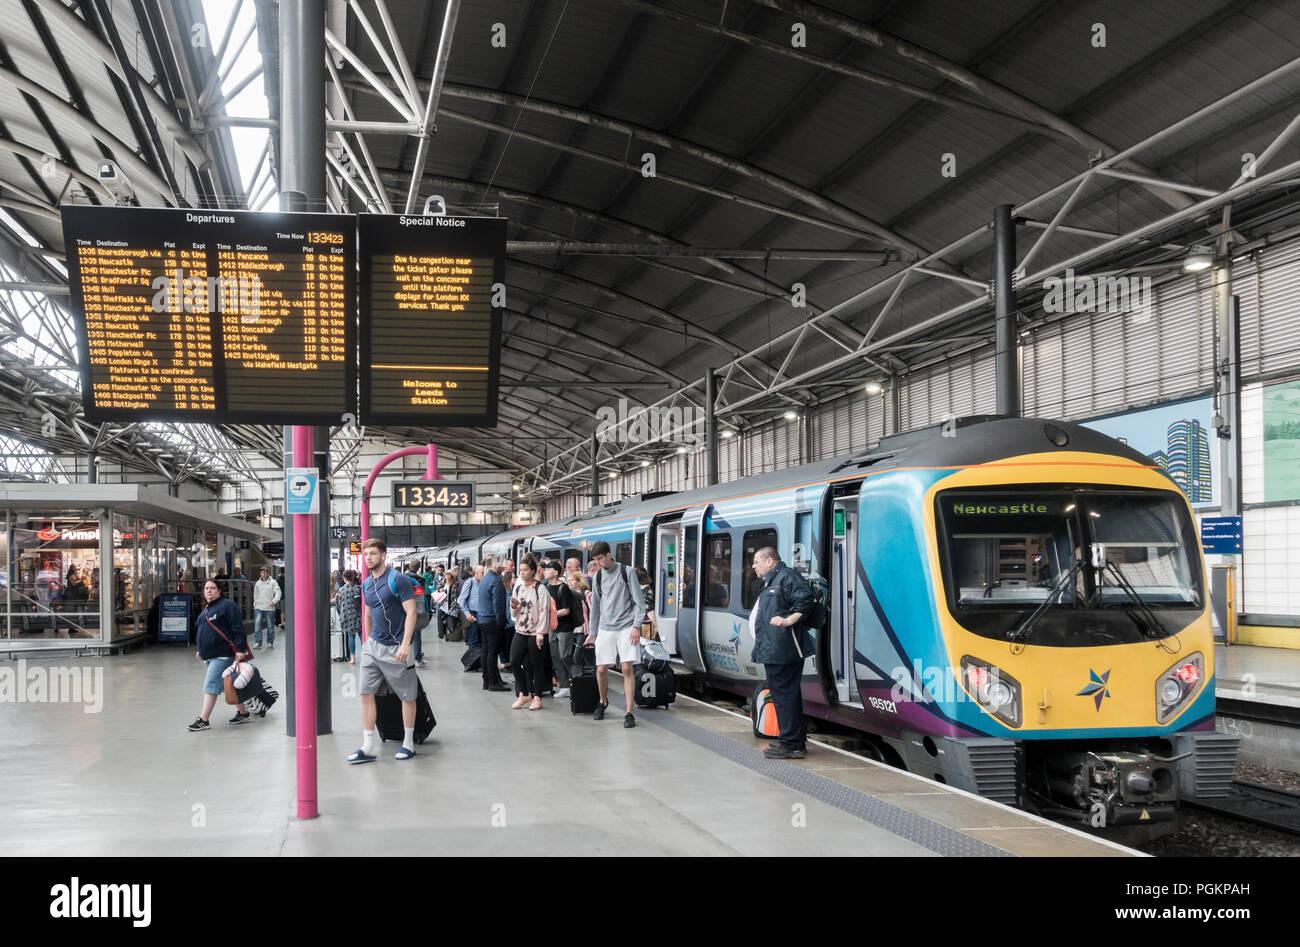 Transpennine Express train at Leeds train station, Leeds, West Yorkshire, England. UK Stock Photo